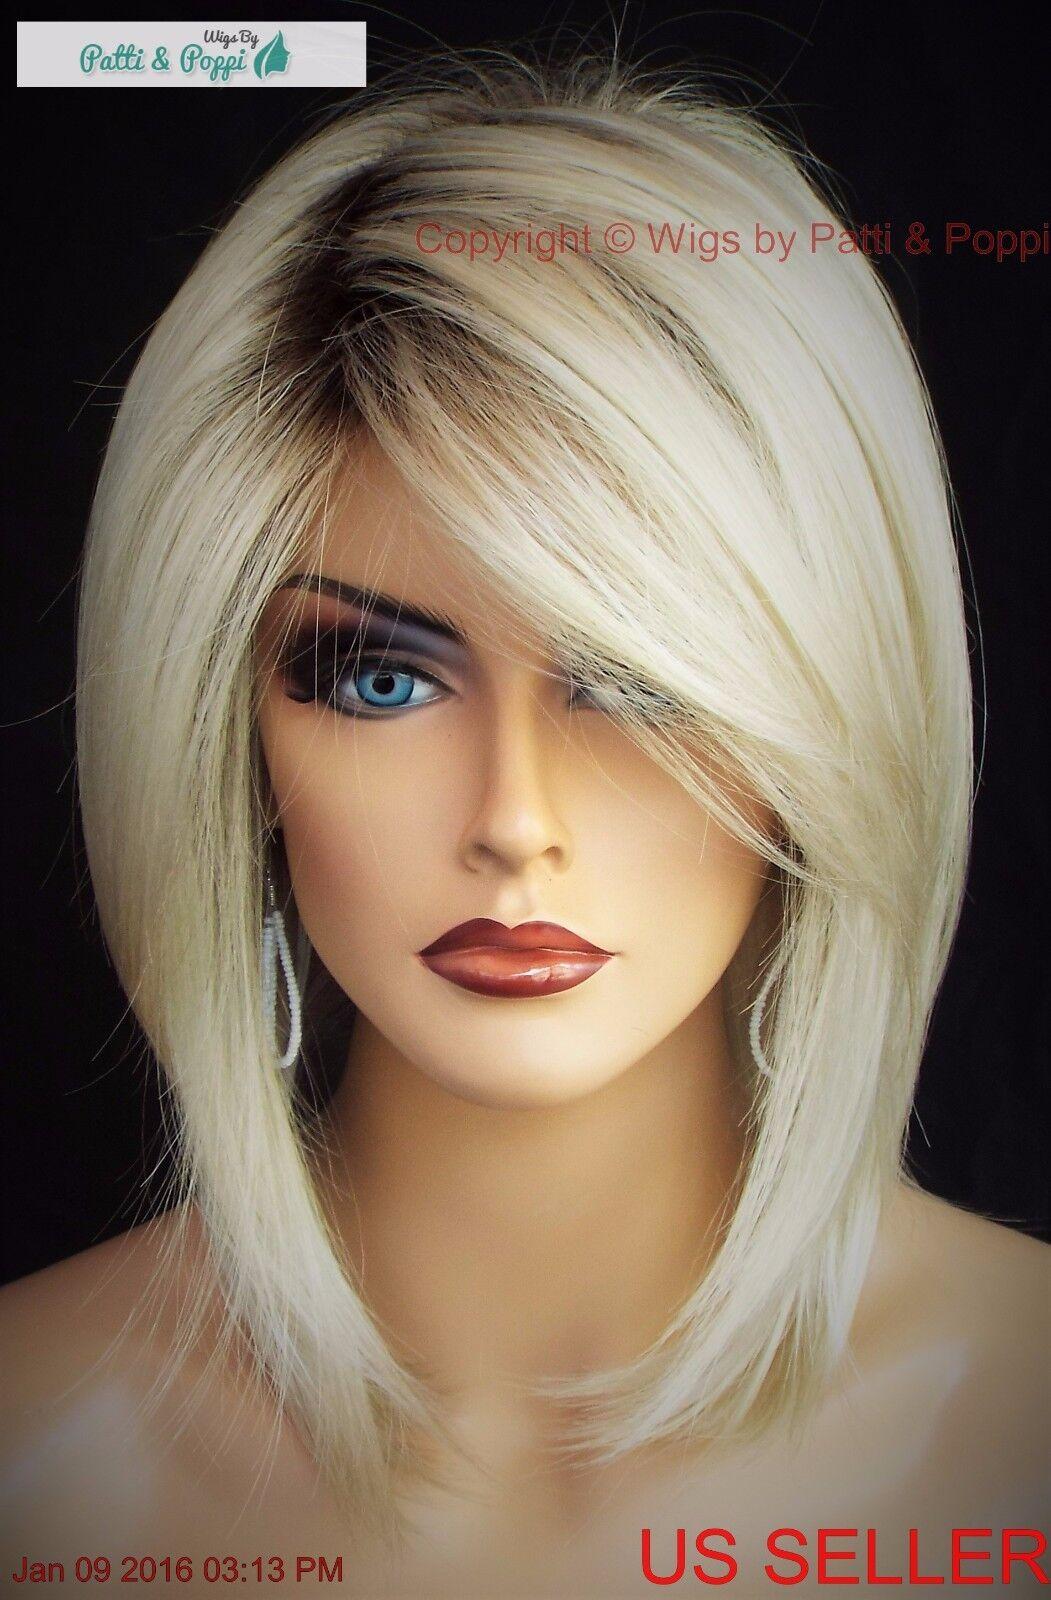 Jackson Noriko Wig Blond Medium Length Stunning Seductive